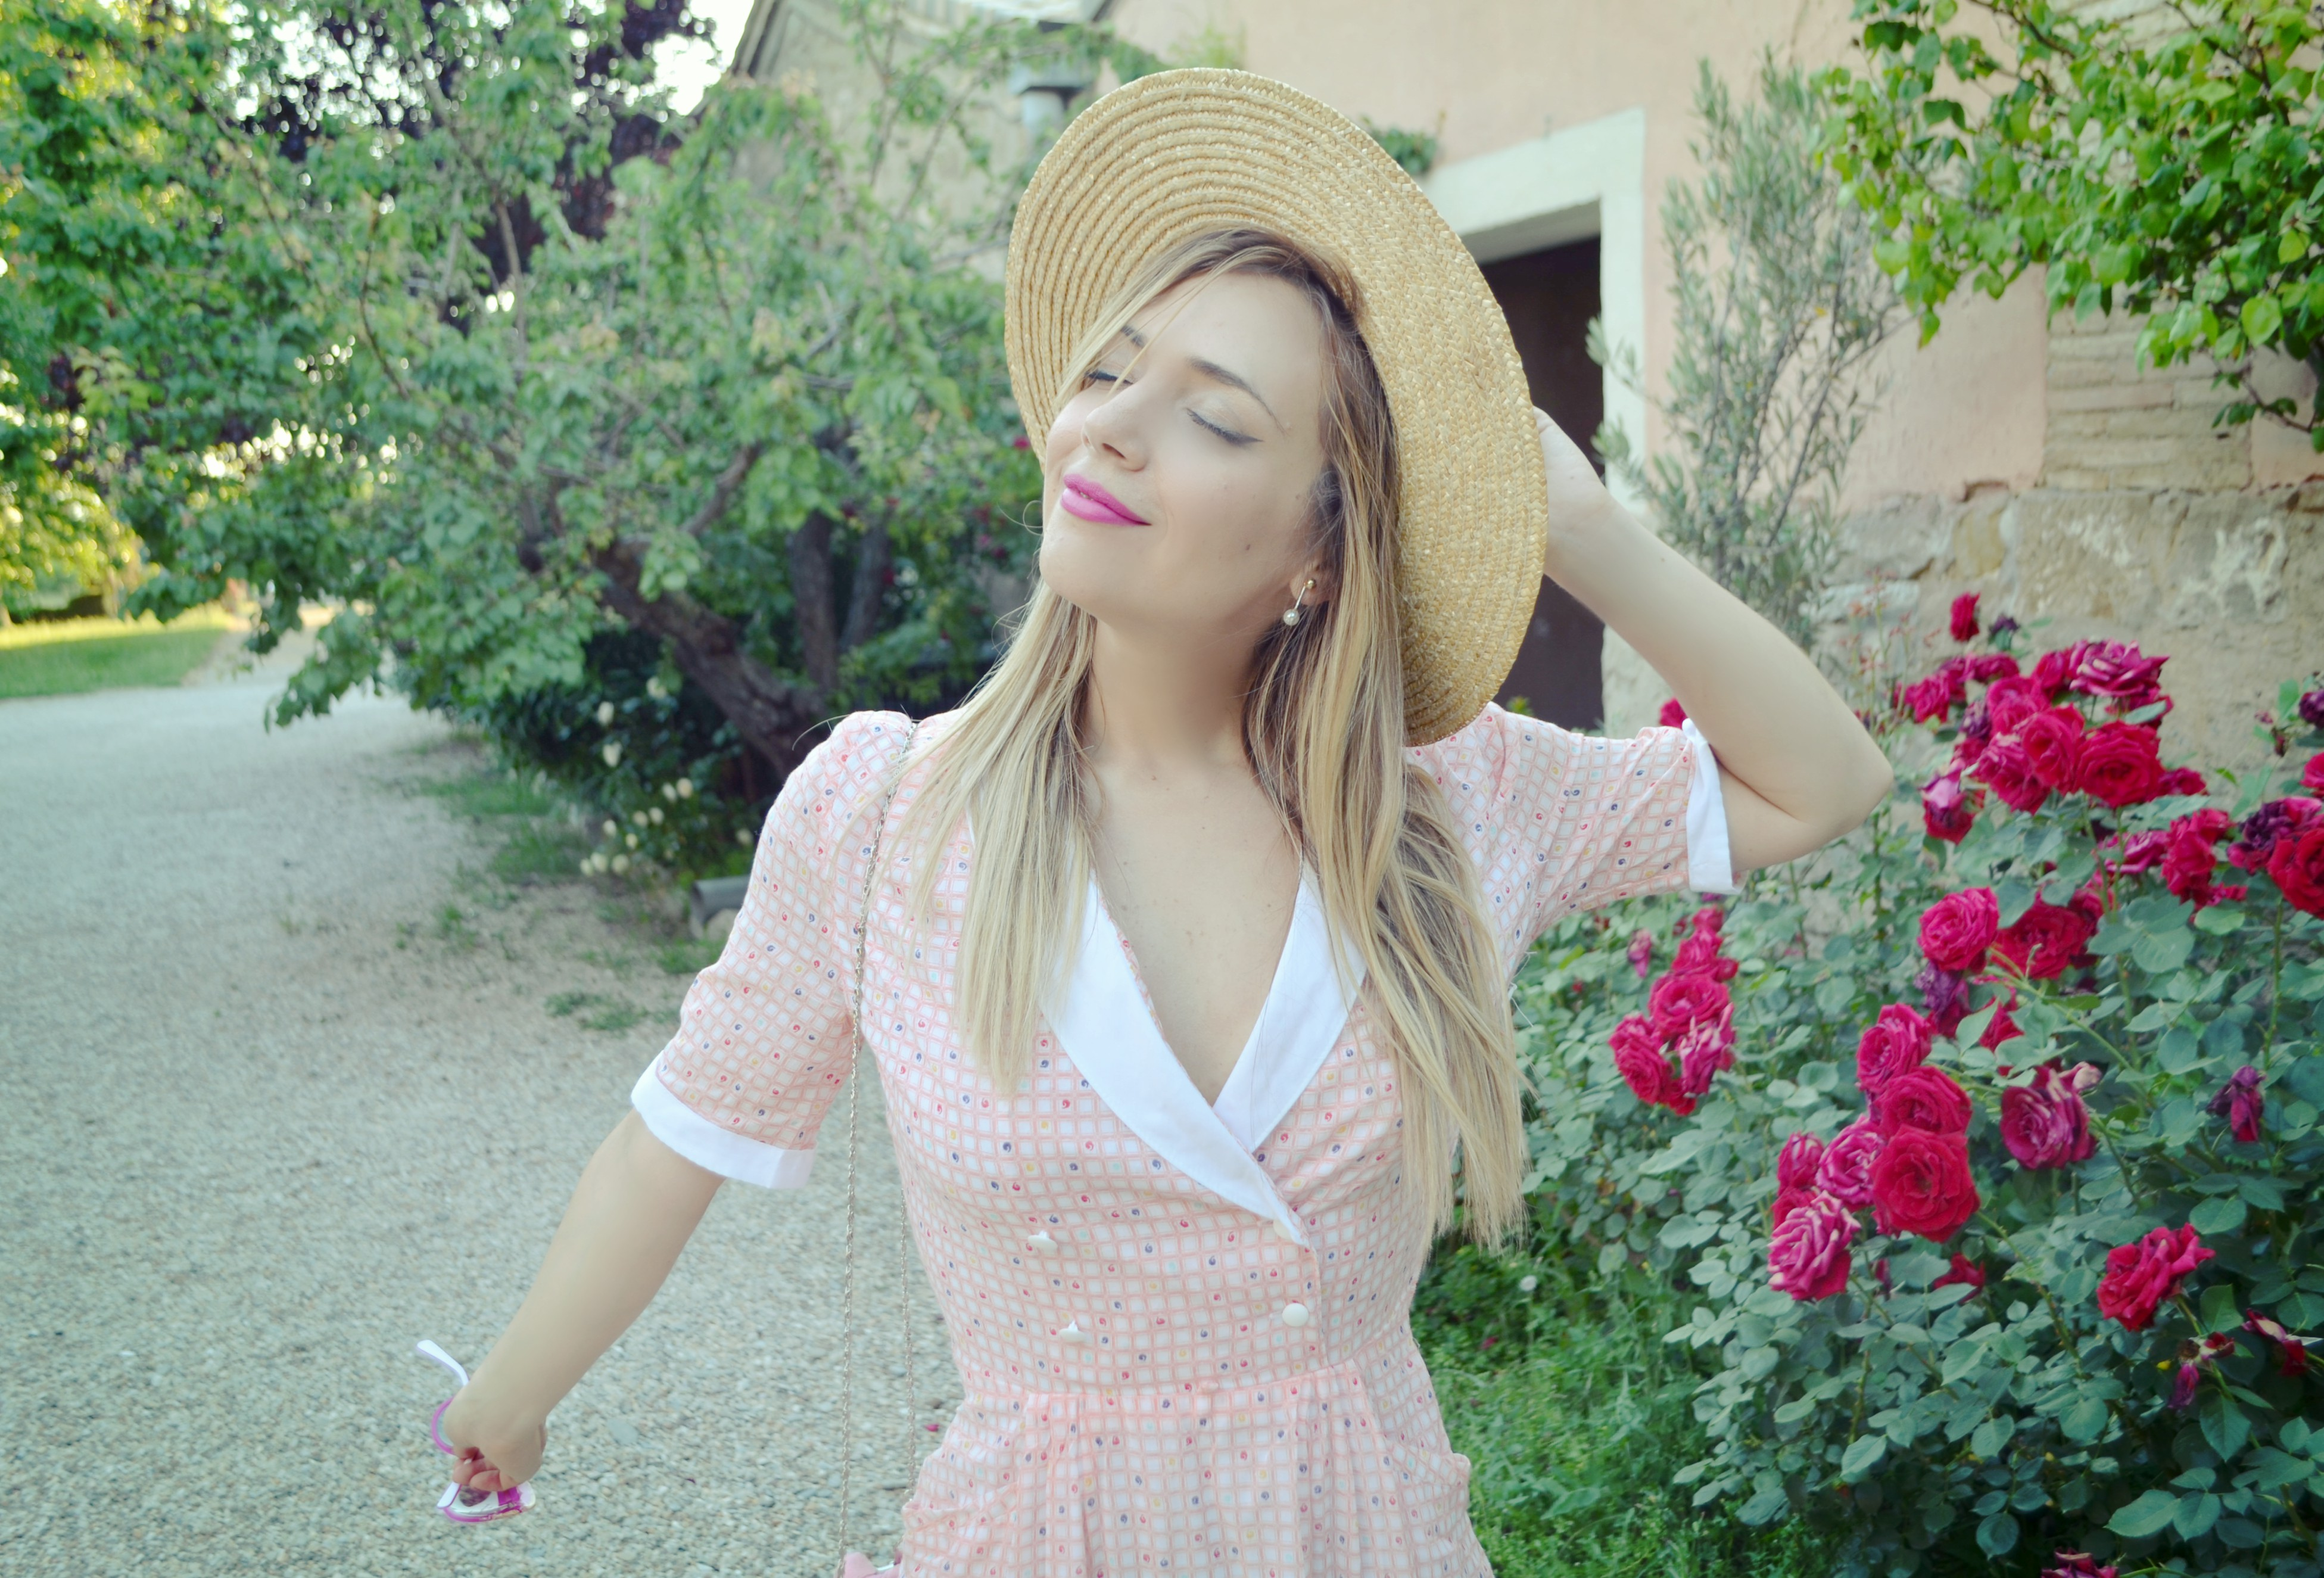 Vintage-dress-ChicAdicta-influencer-Madrid-Chic-Adicta-outfit-rosa-de-verano-canotier-look-florette-PiensaenChic-Piensa-en-Chic